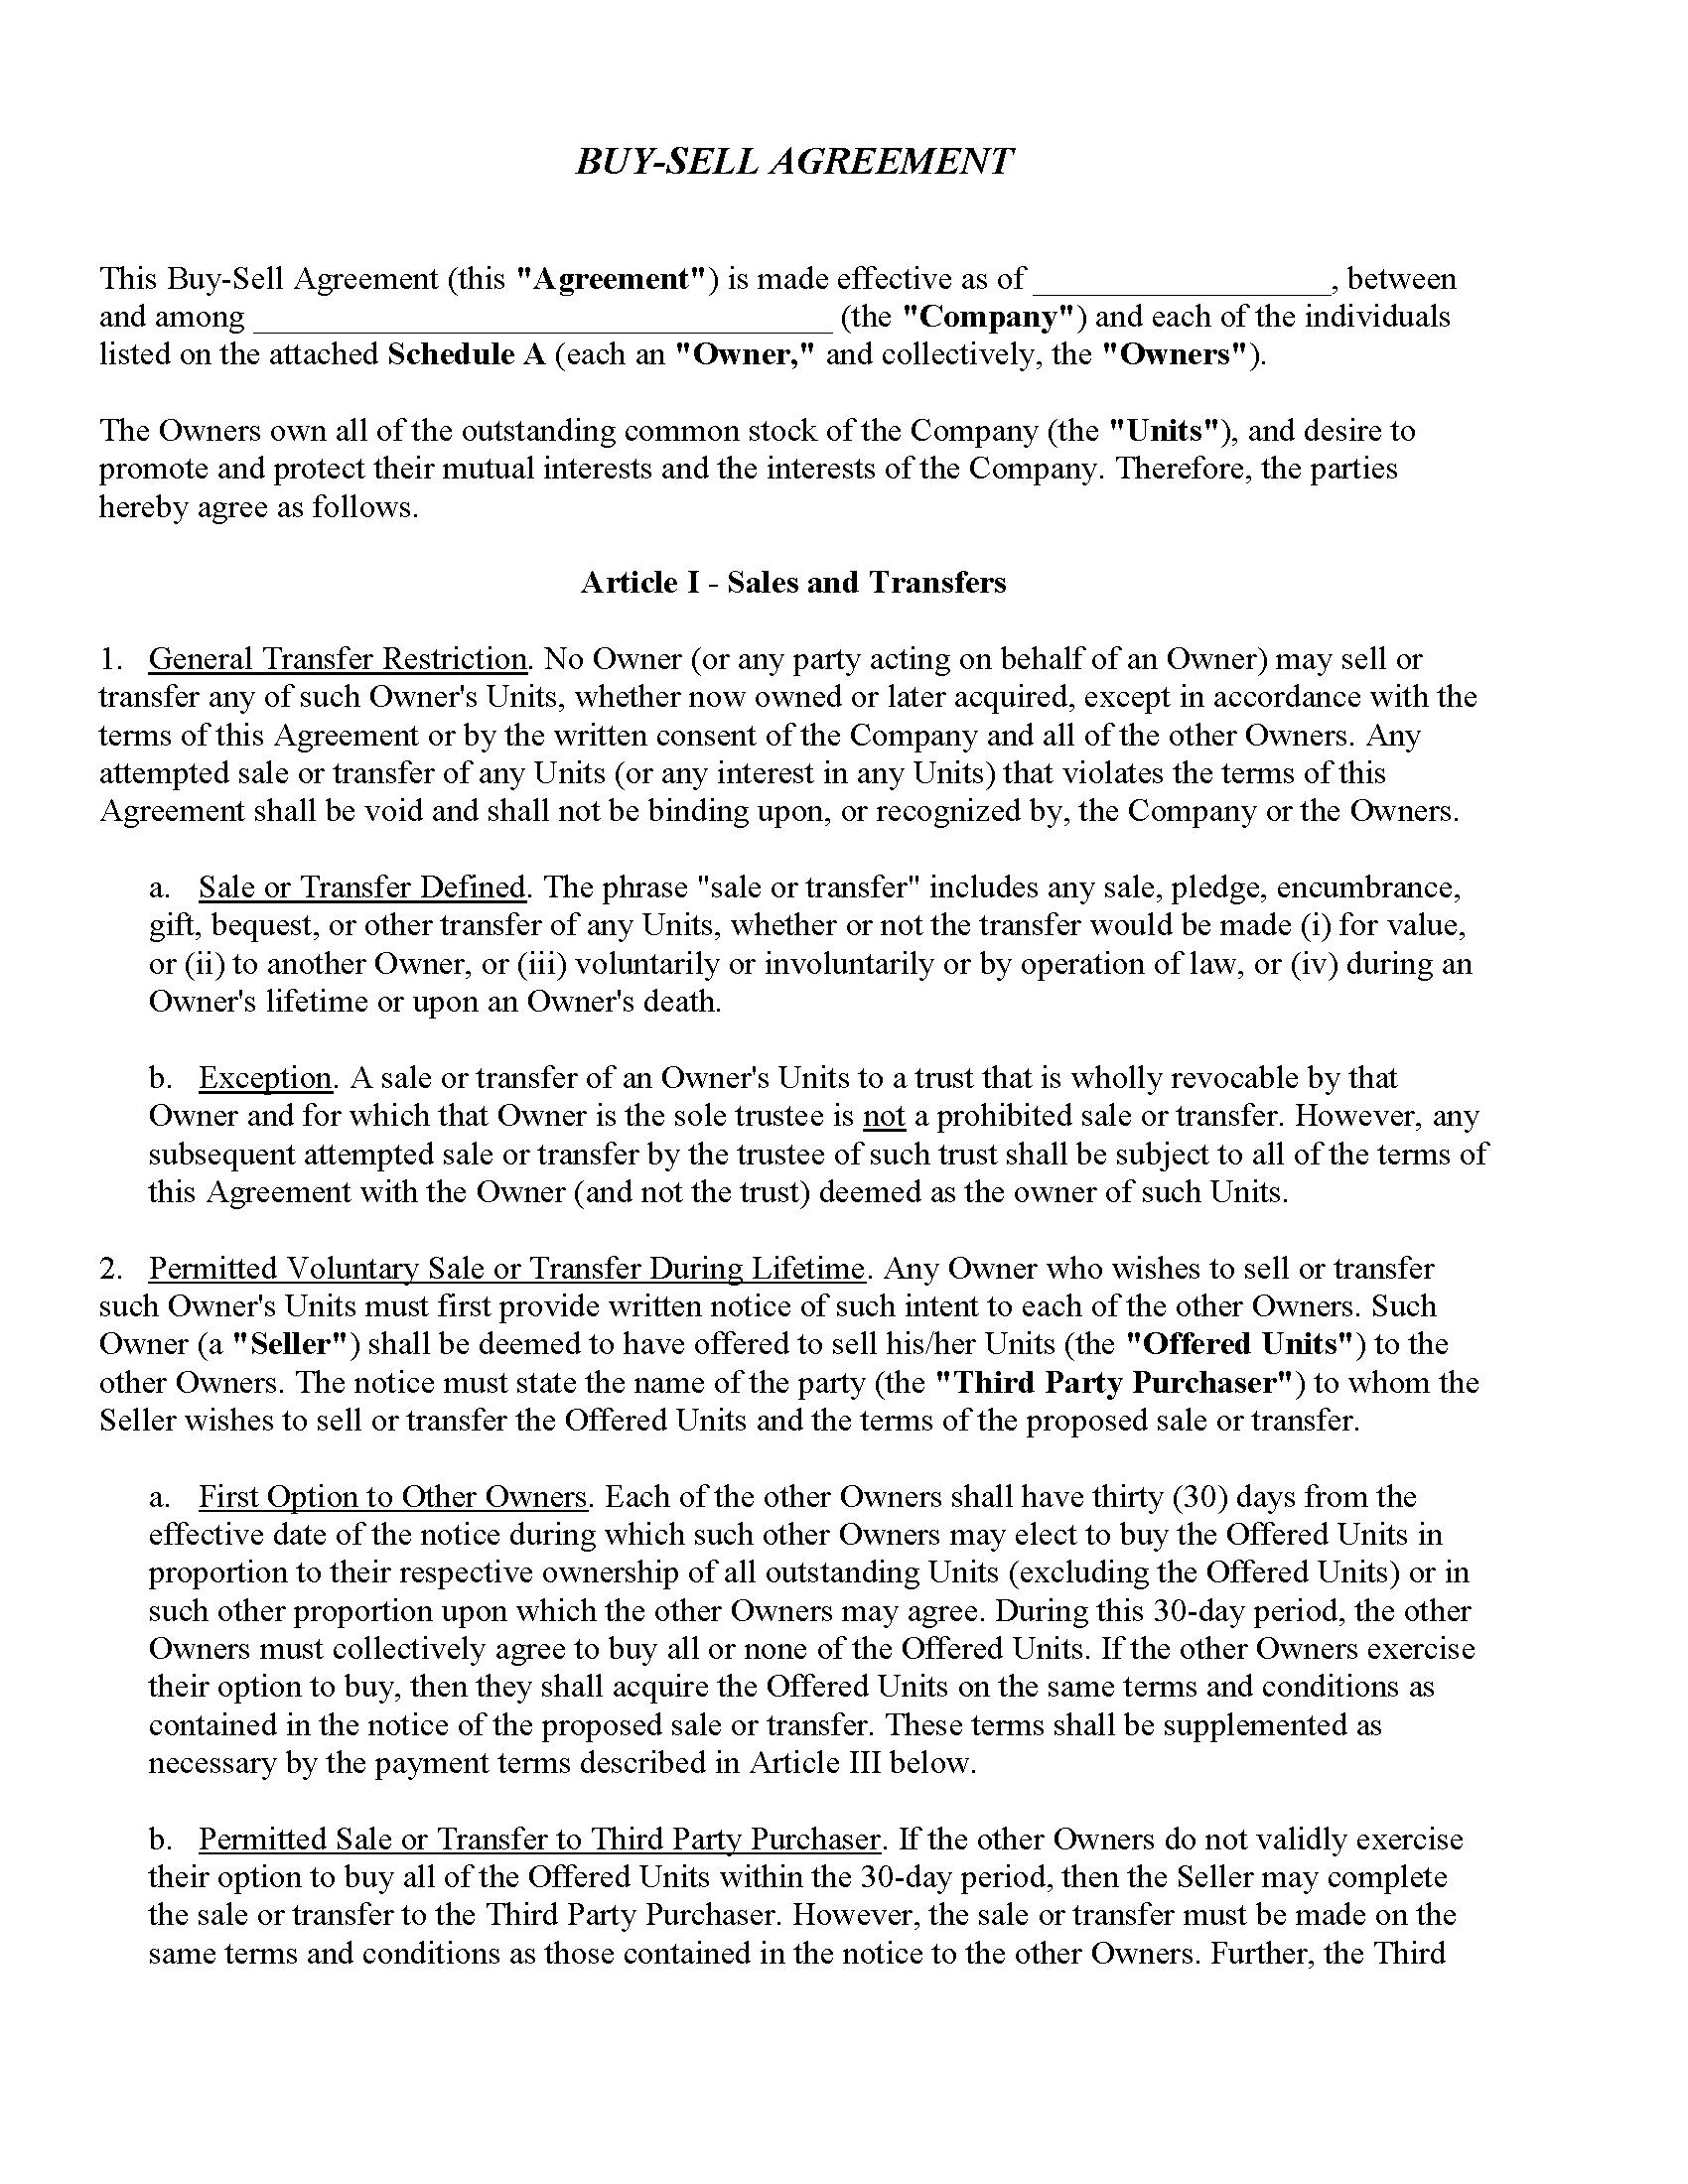 North Dakota Buy-Sell Agreement